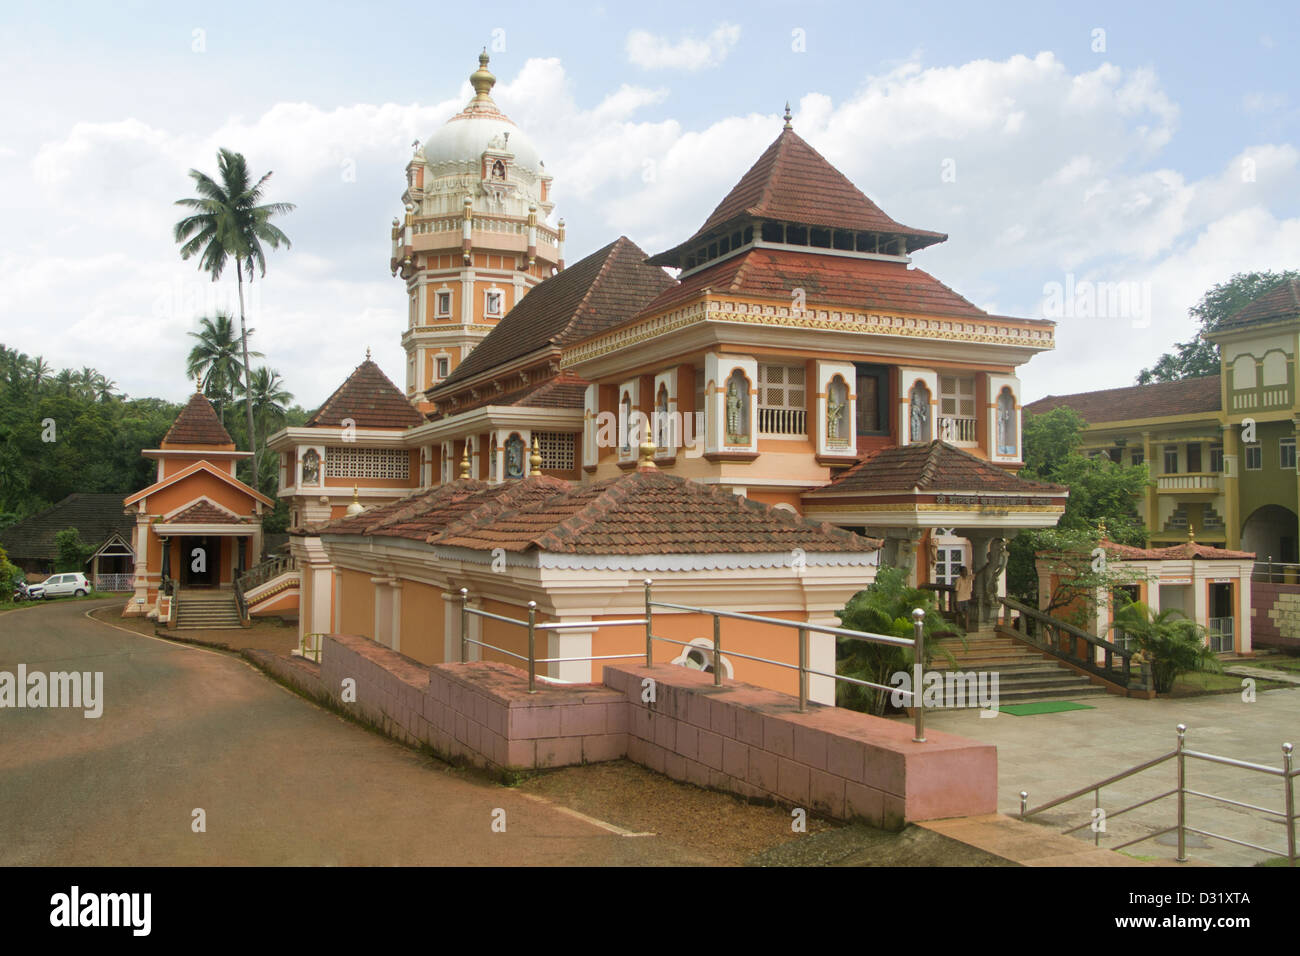 Shri Devi Shantadurga Tempel, 33 km von Panaji am Fuße des Kavalem Dorf in Ponda Taluka, Goa, Indien Stockfoto